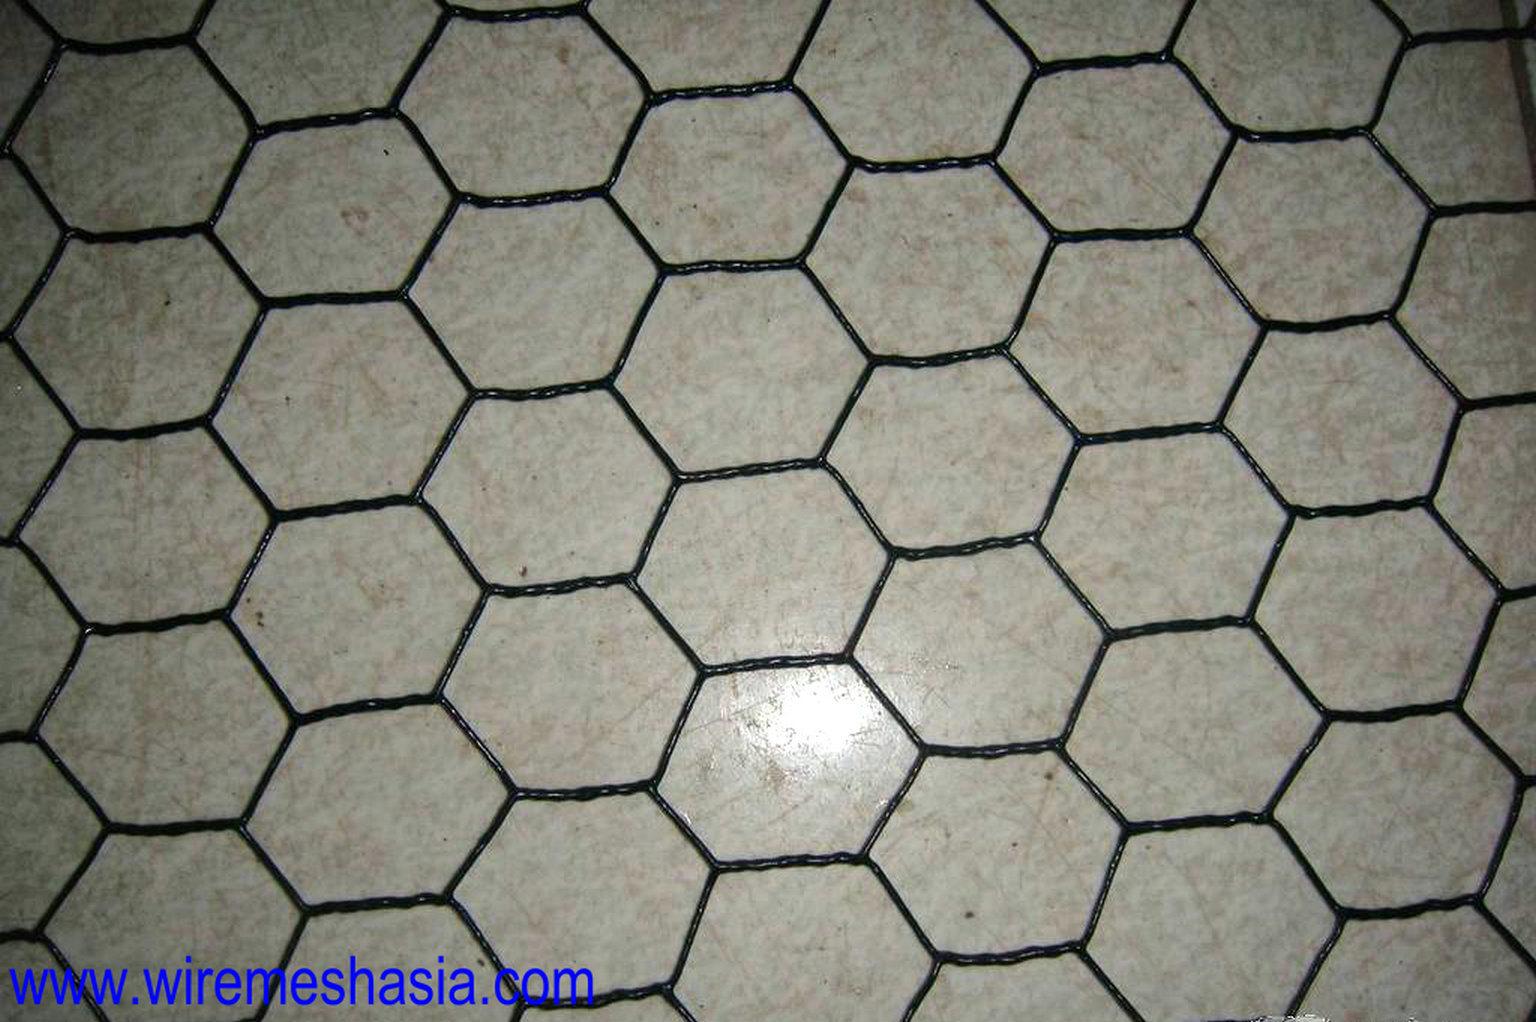 China Pvc Coated Hexagonal Wire Mesh China Pvc Coated